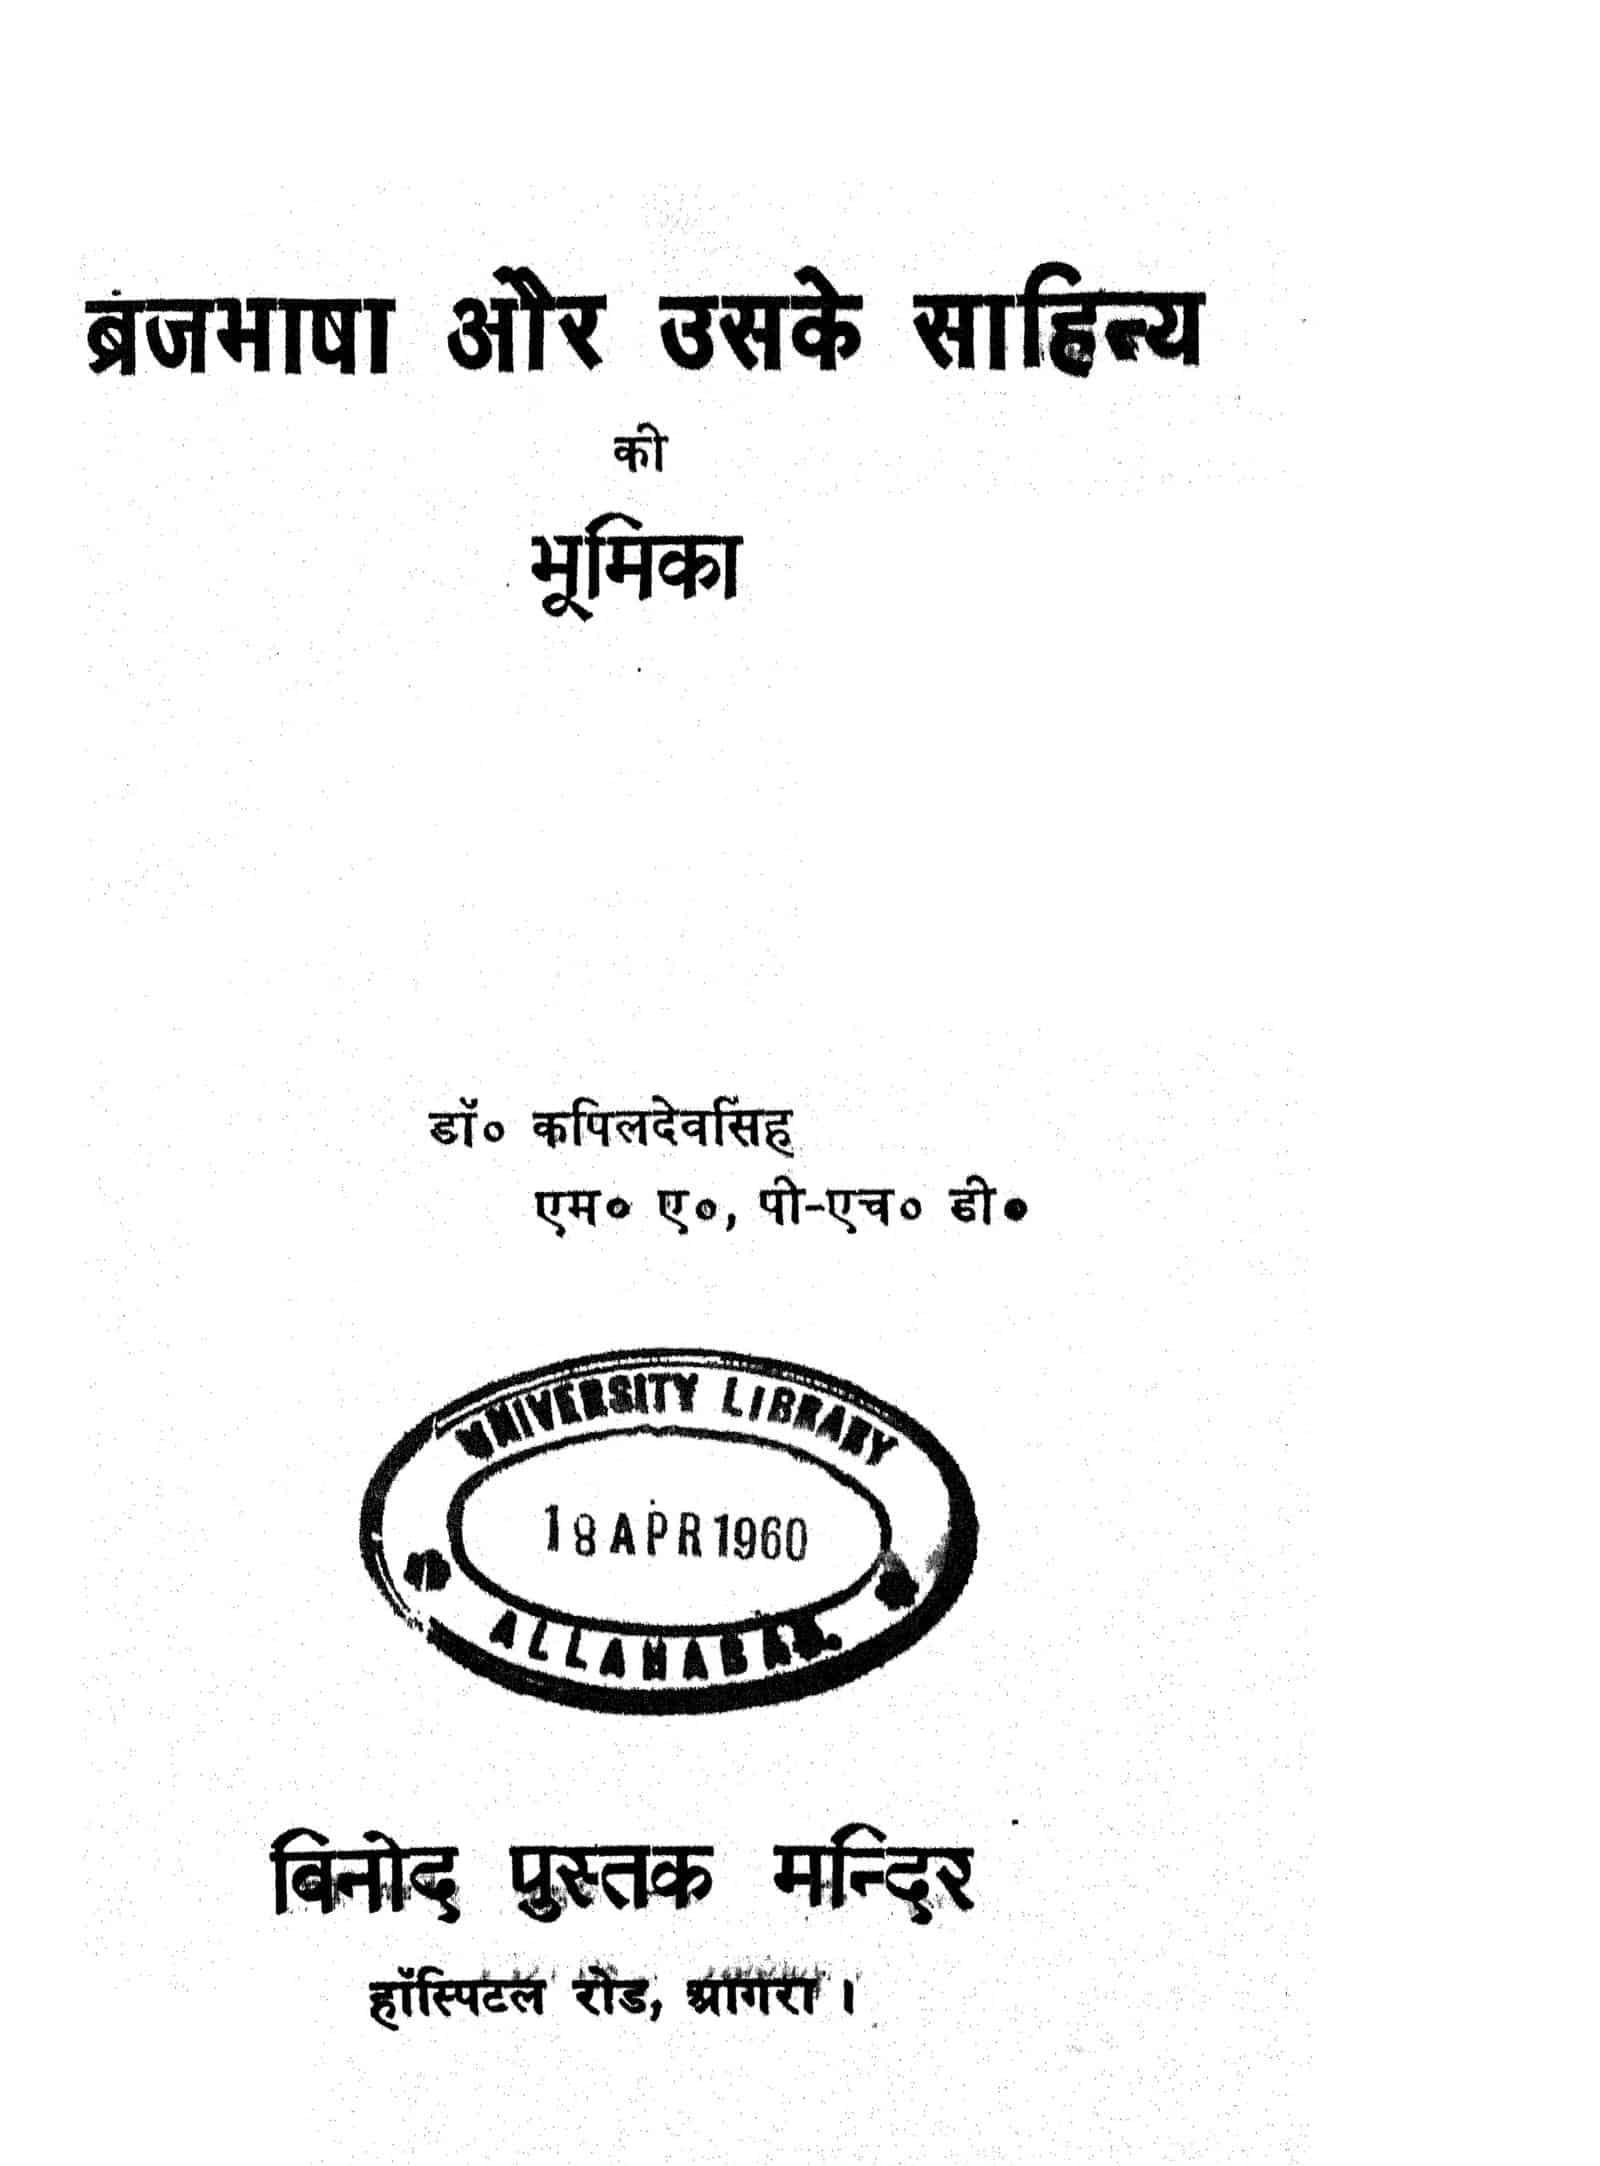 Book Image : ब्रजभाषा और उसके साहित्य की भूमिका  - Brajbhasha Aur Uske Sahitya Ki Bhoomika